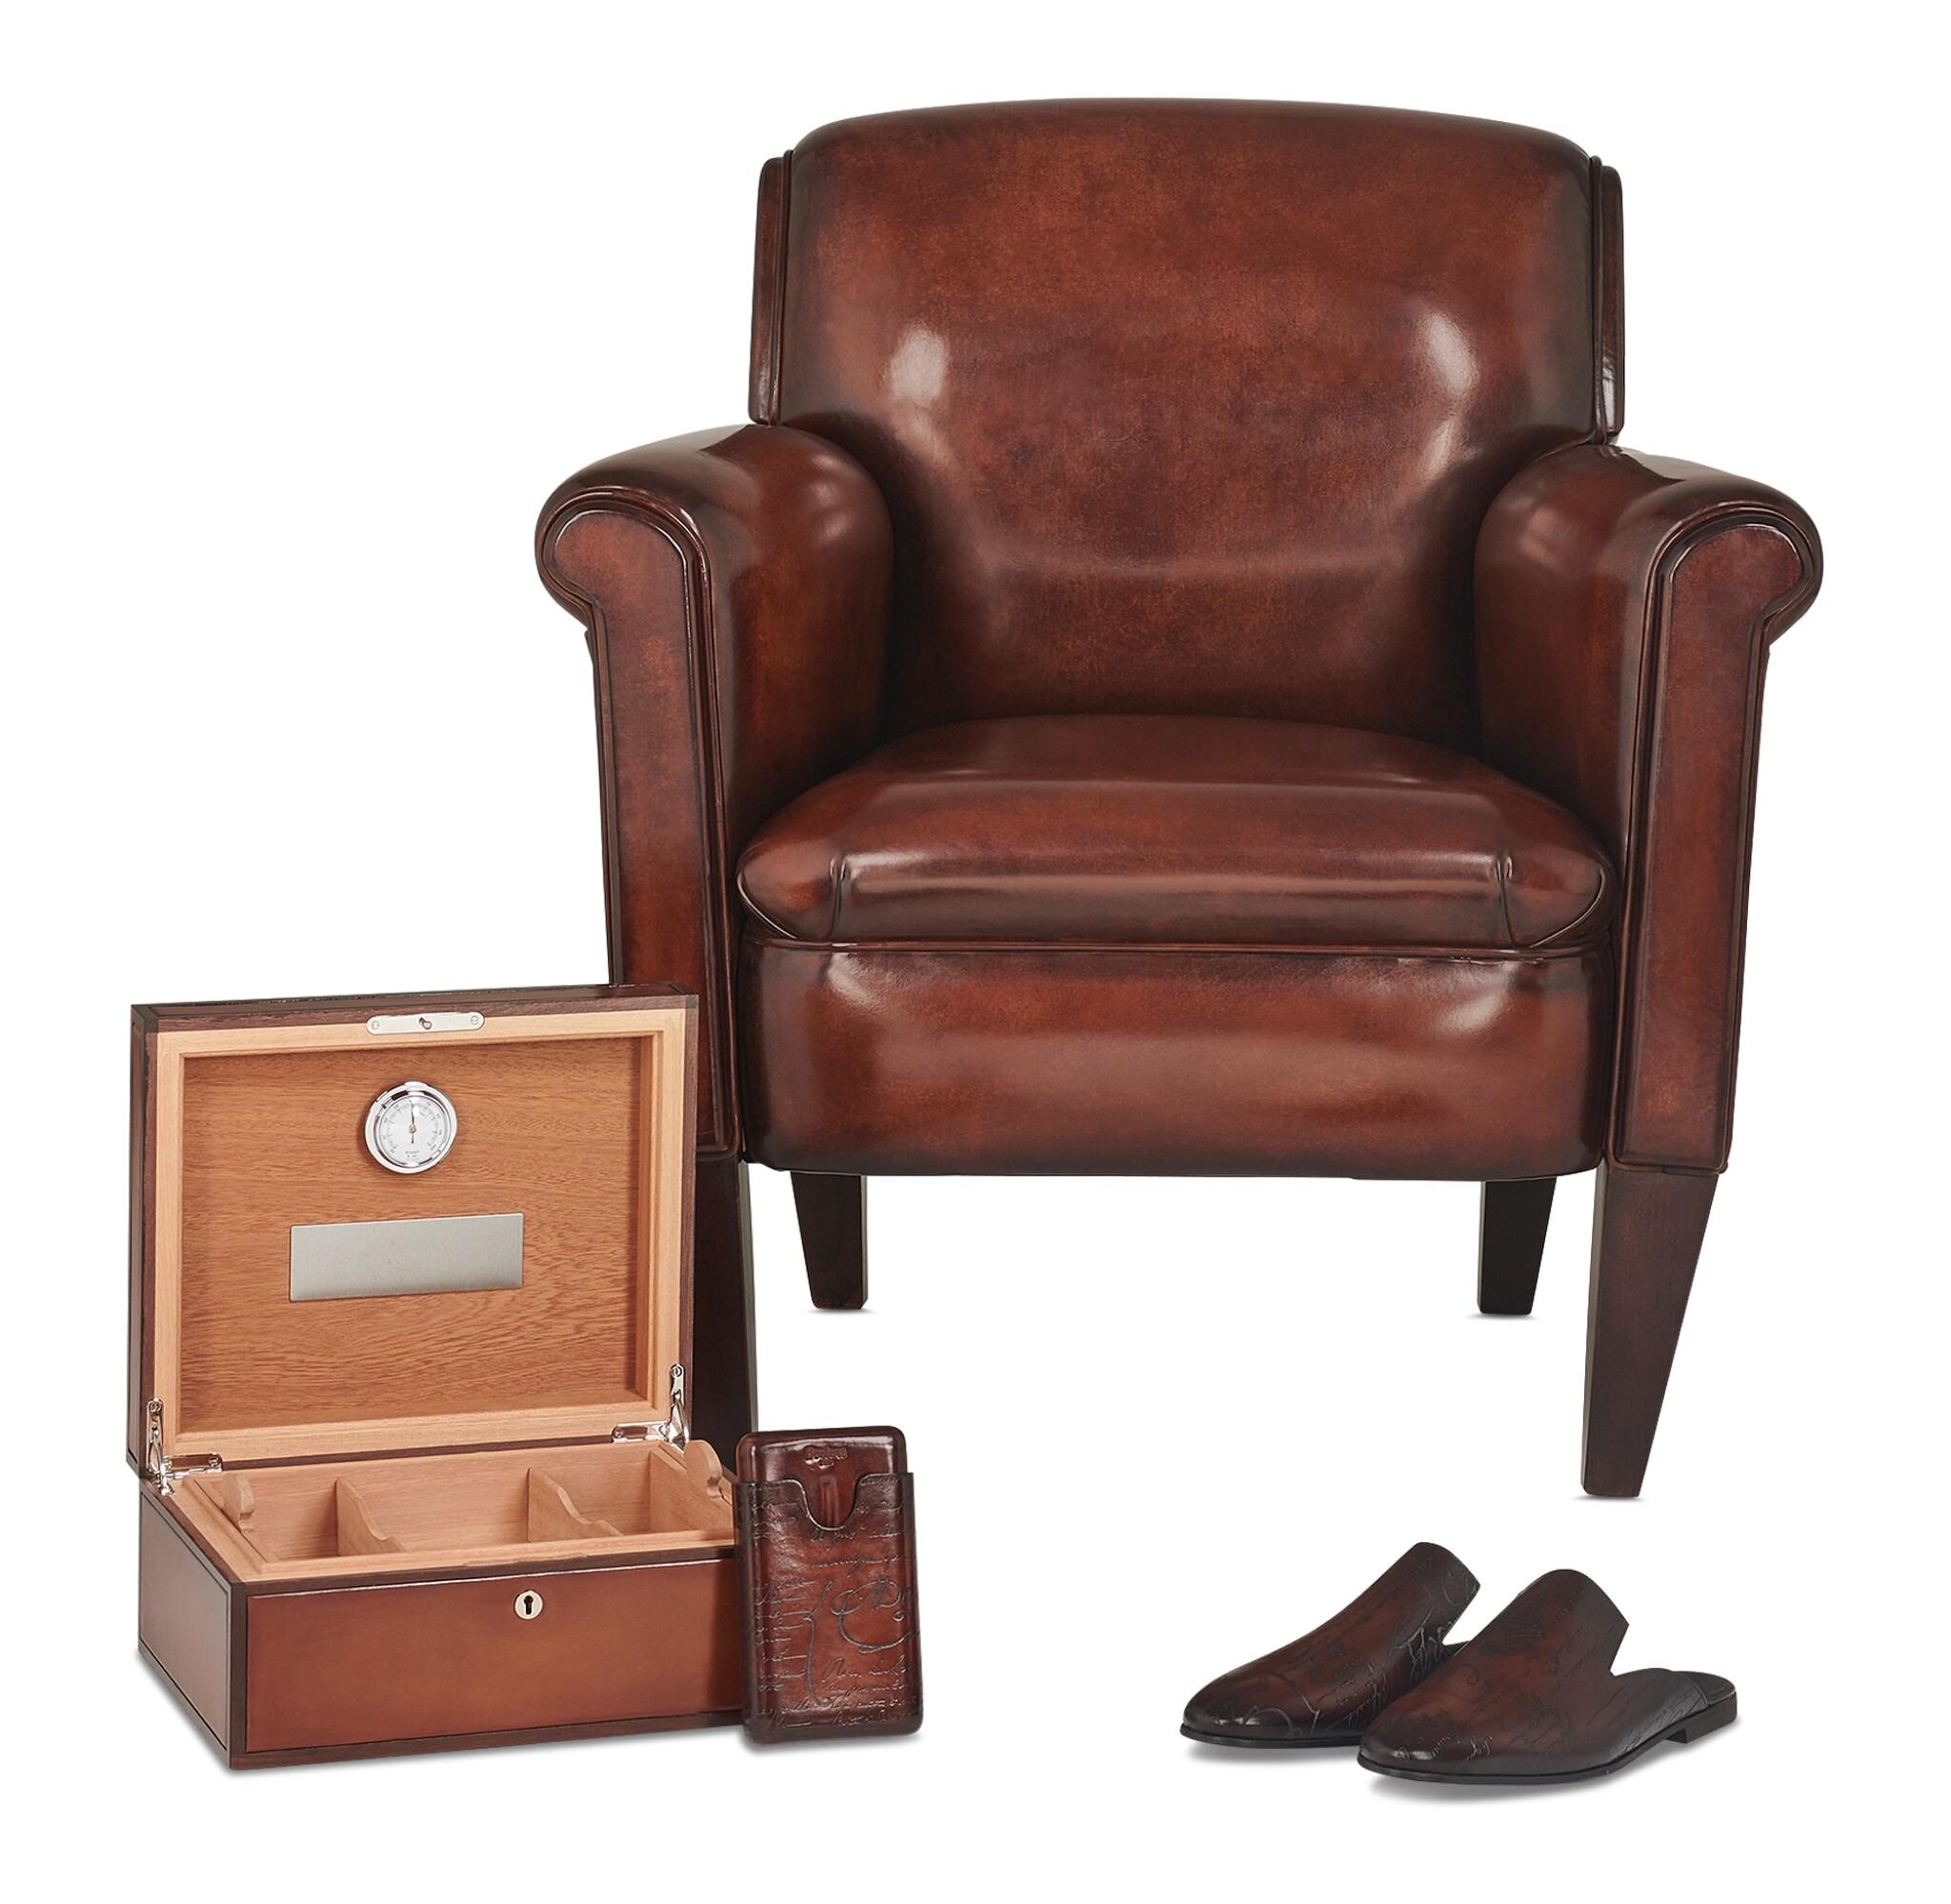 View full screen - View 1 of Lot 3. Berluti   Cigar Box, Cigar Case, Club Chairs and Cyrus Slippers (Boîte à Cigares, Étui à Cigares, Fauteuils Club et Slipper Cyrus ) [5 Items / Articles].